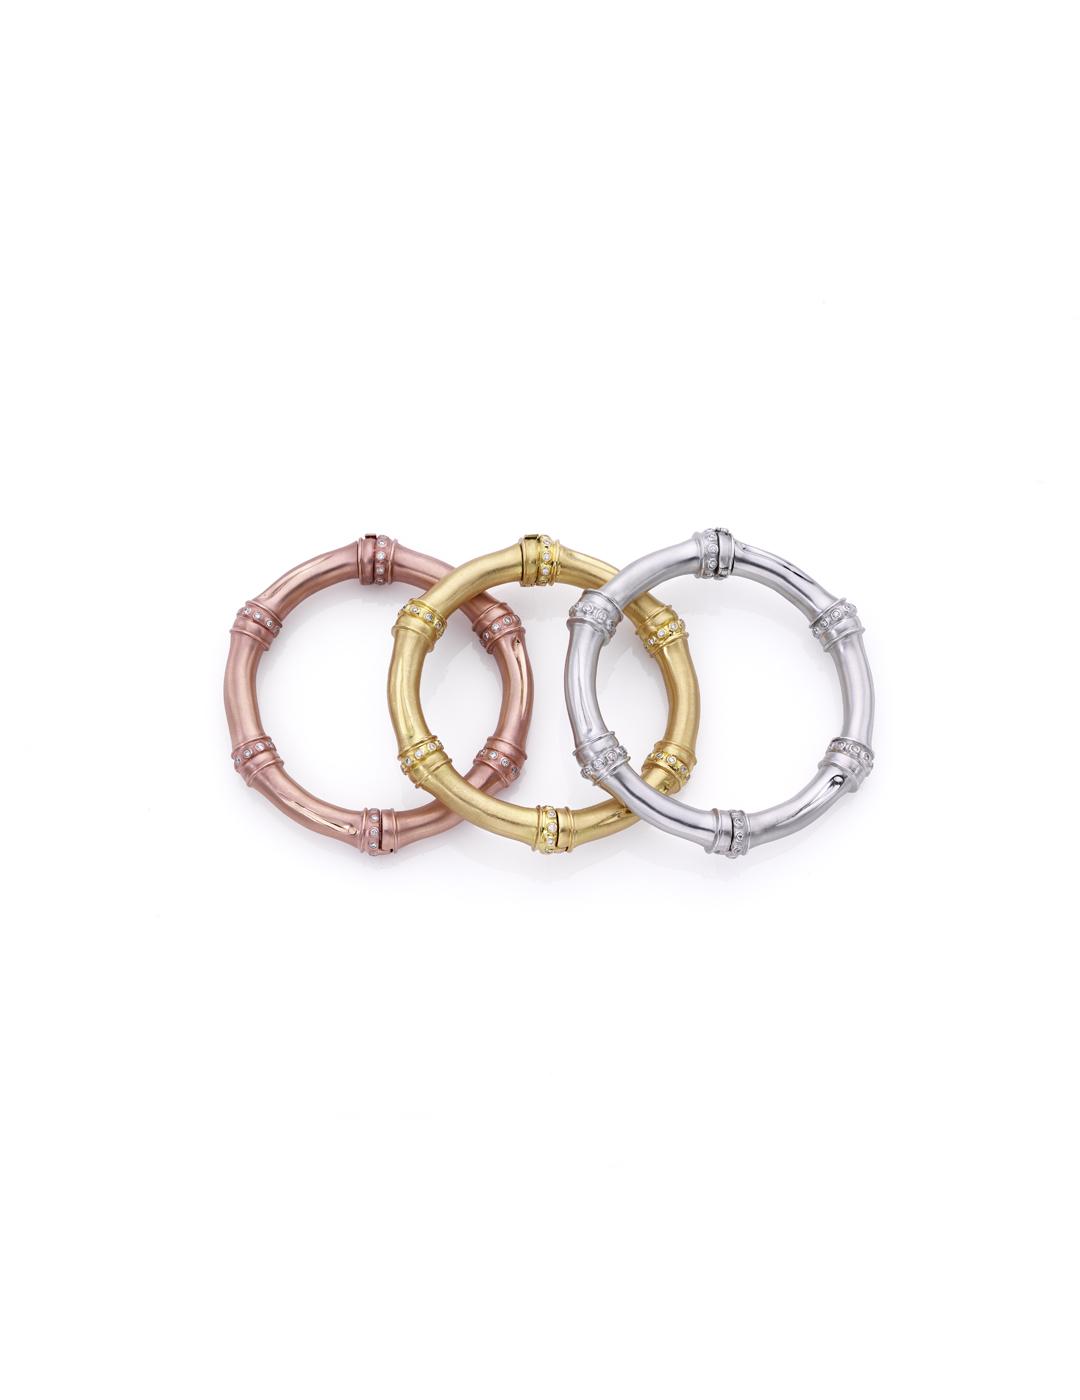 mish_jewelry_product_Jungle-Bamboo-RG-Bangle-3